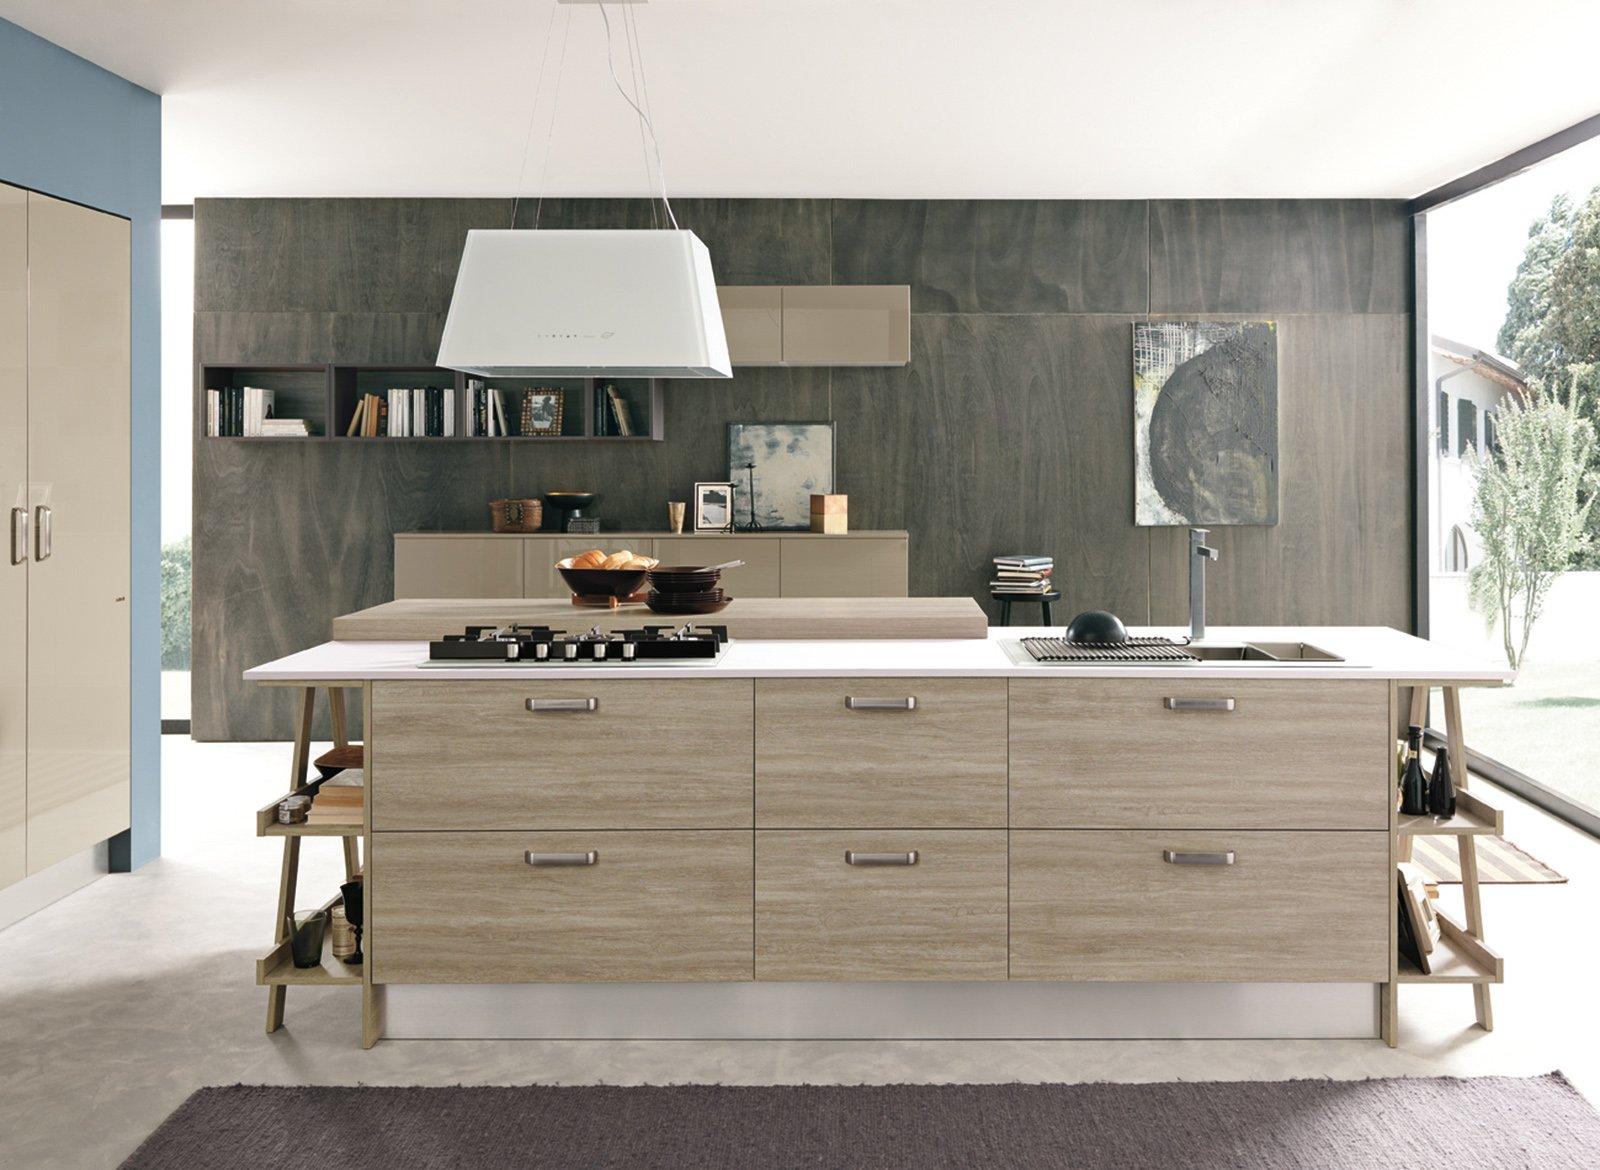 Cucine ikea con isola ~ avienix.com for .